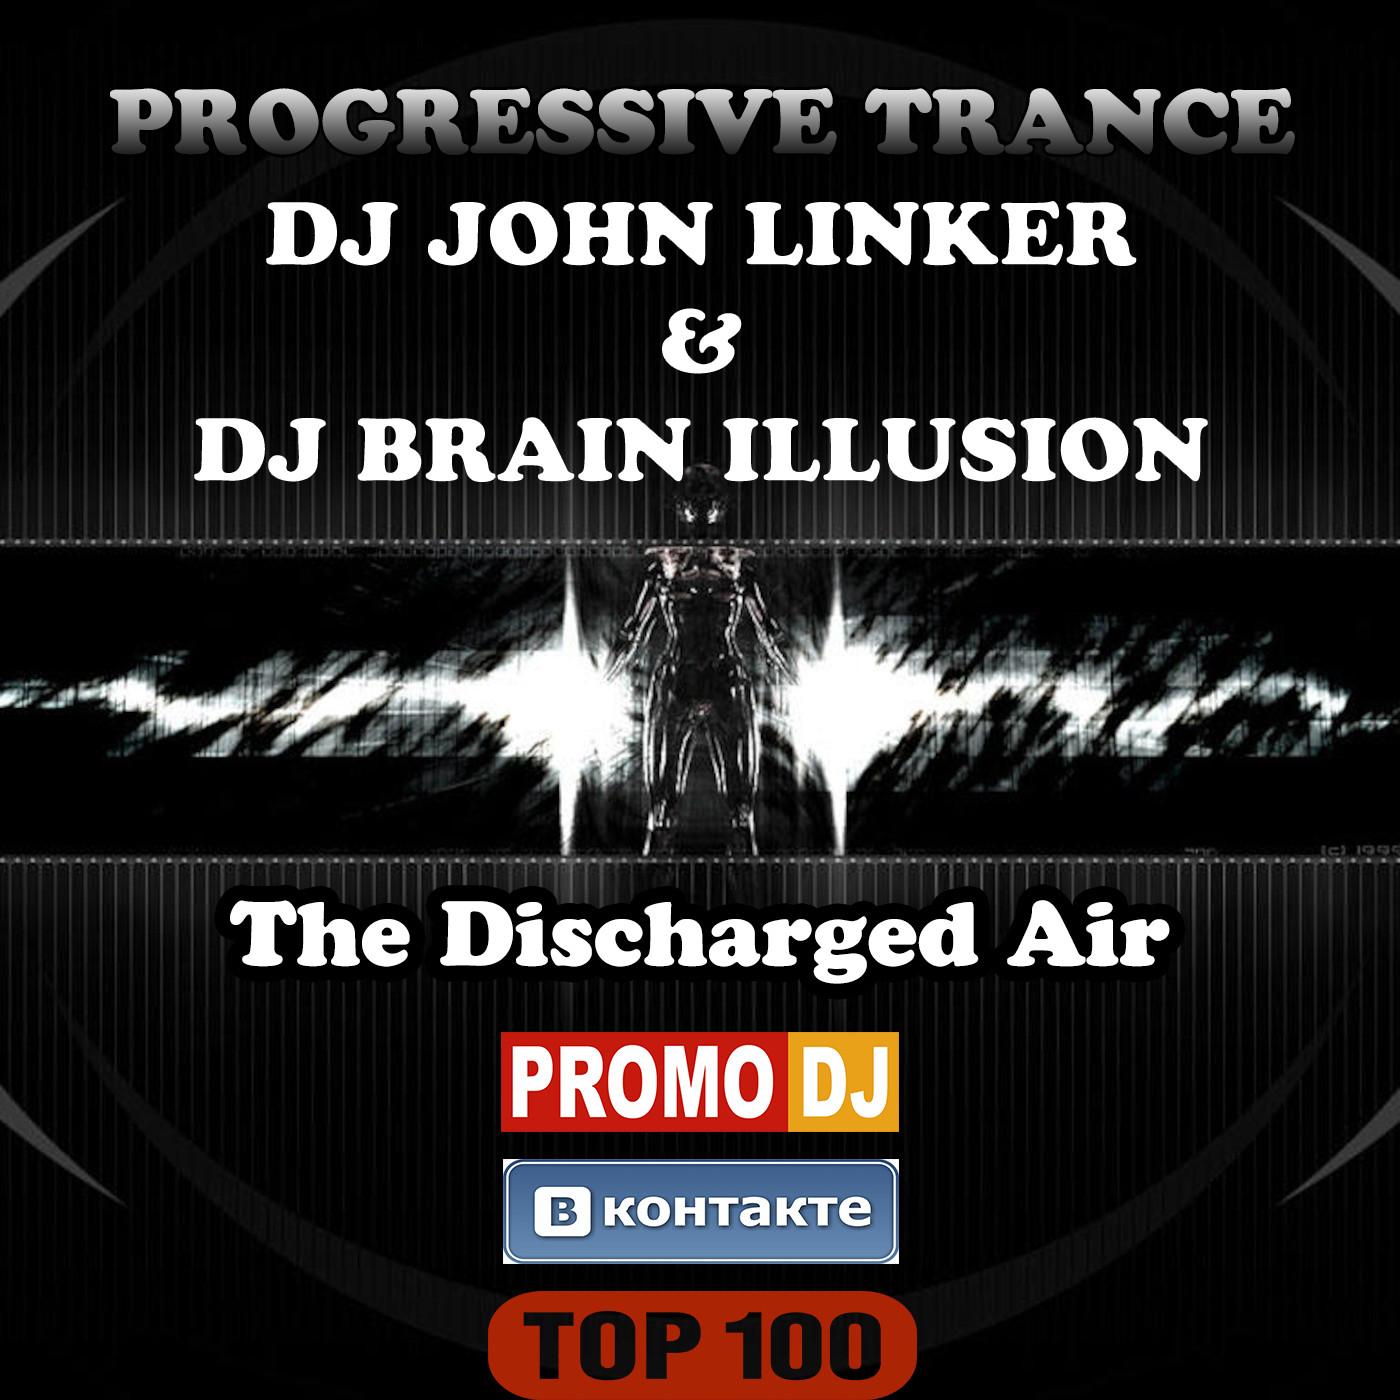 Dj John Linker & Dj Brain iLLusion - The Discharged Air (Progressive